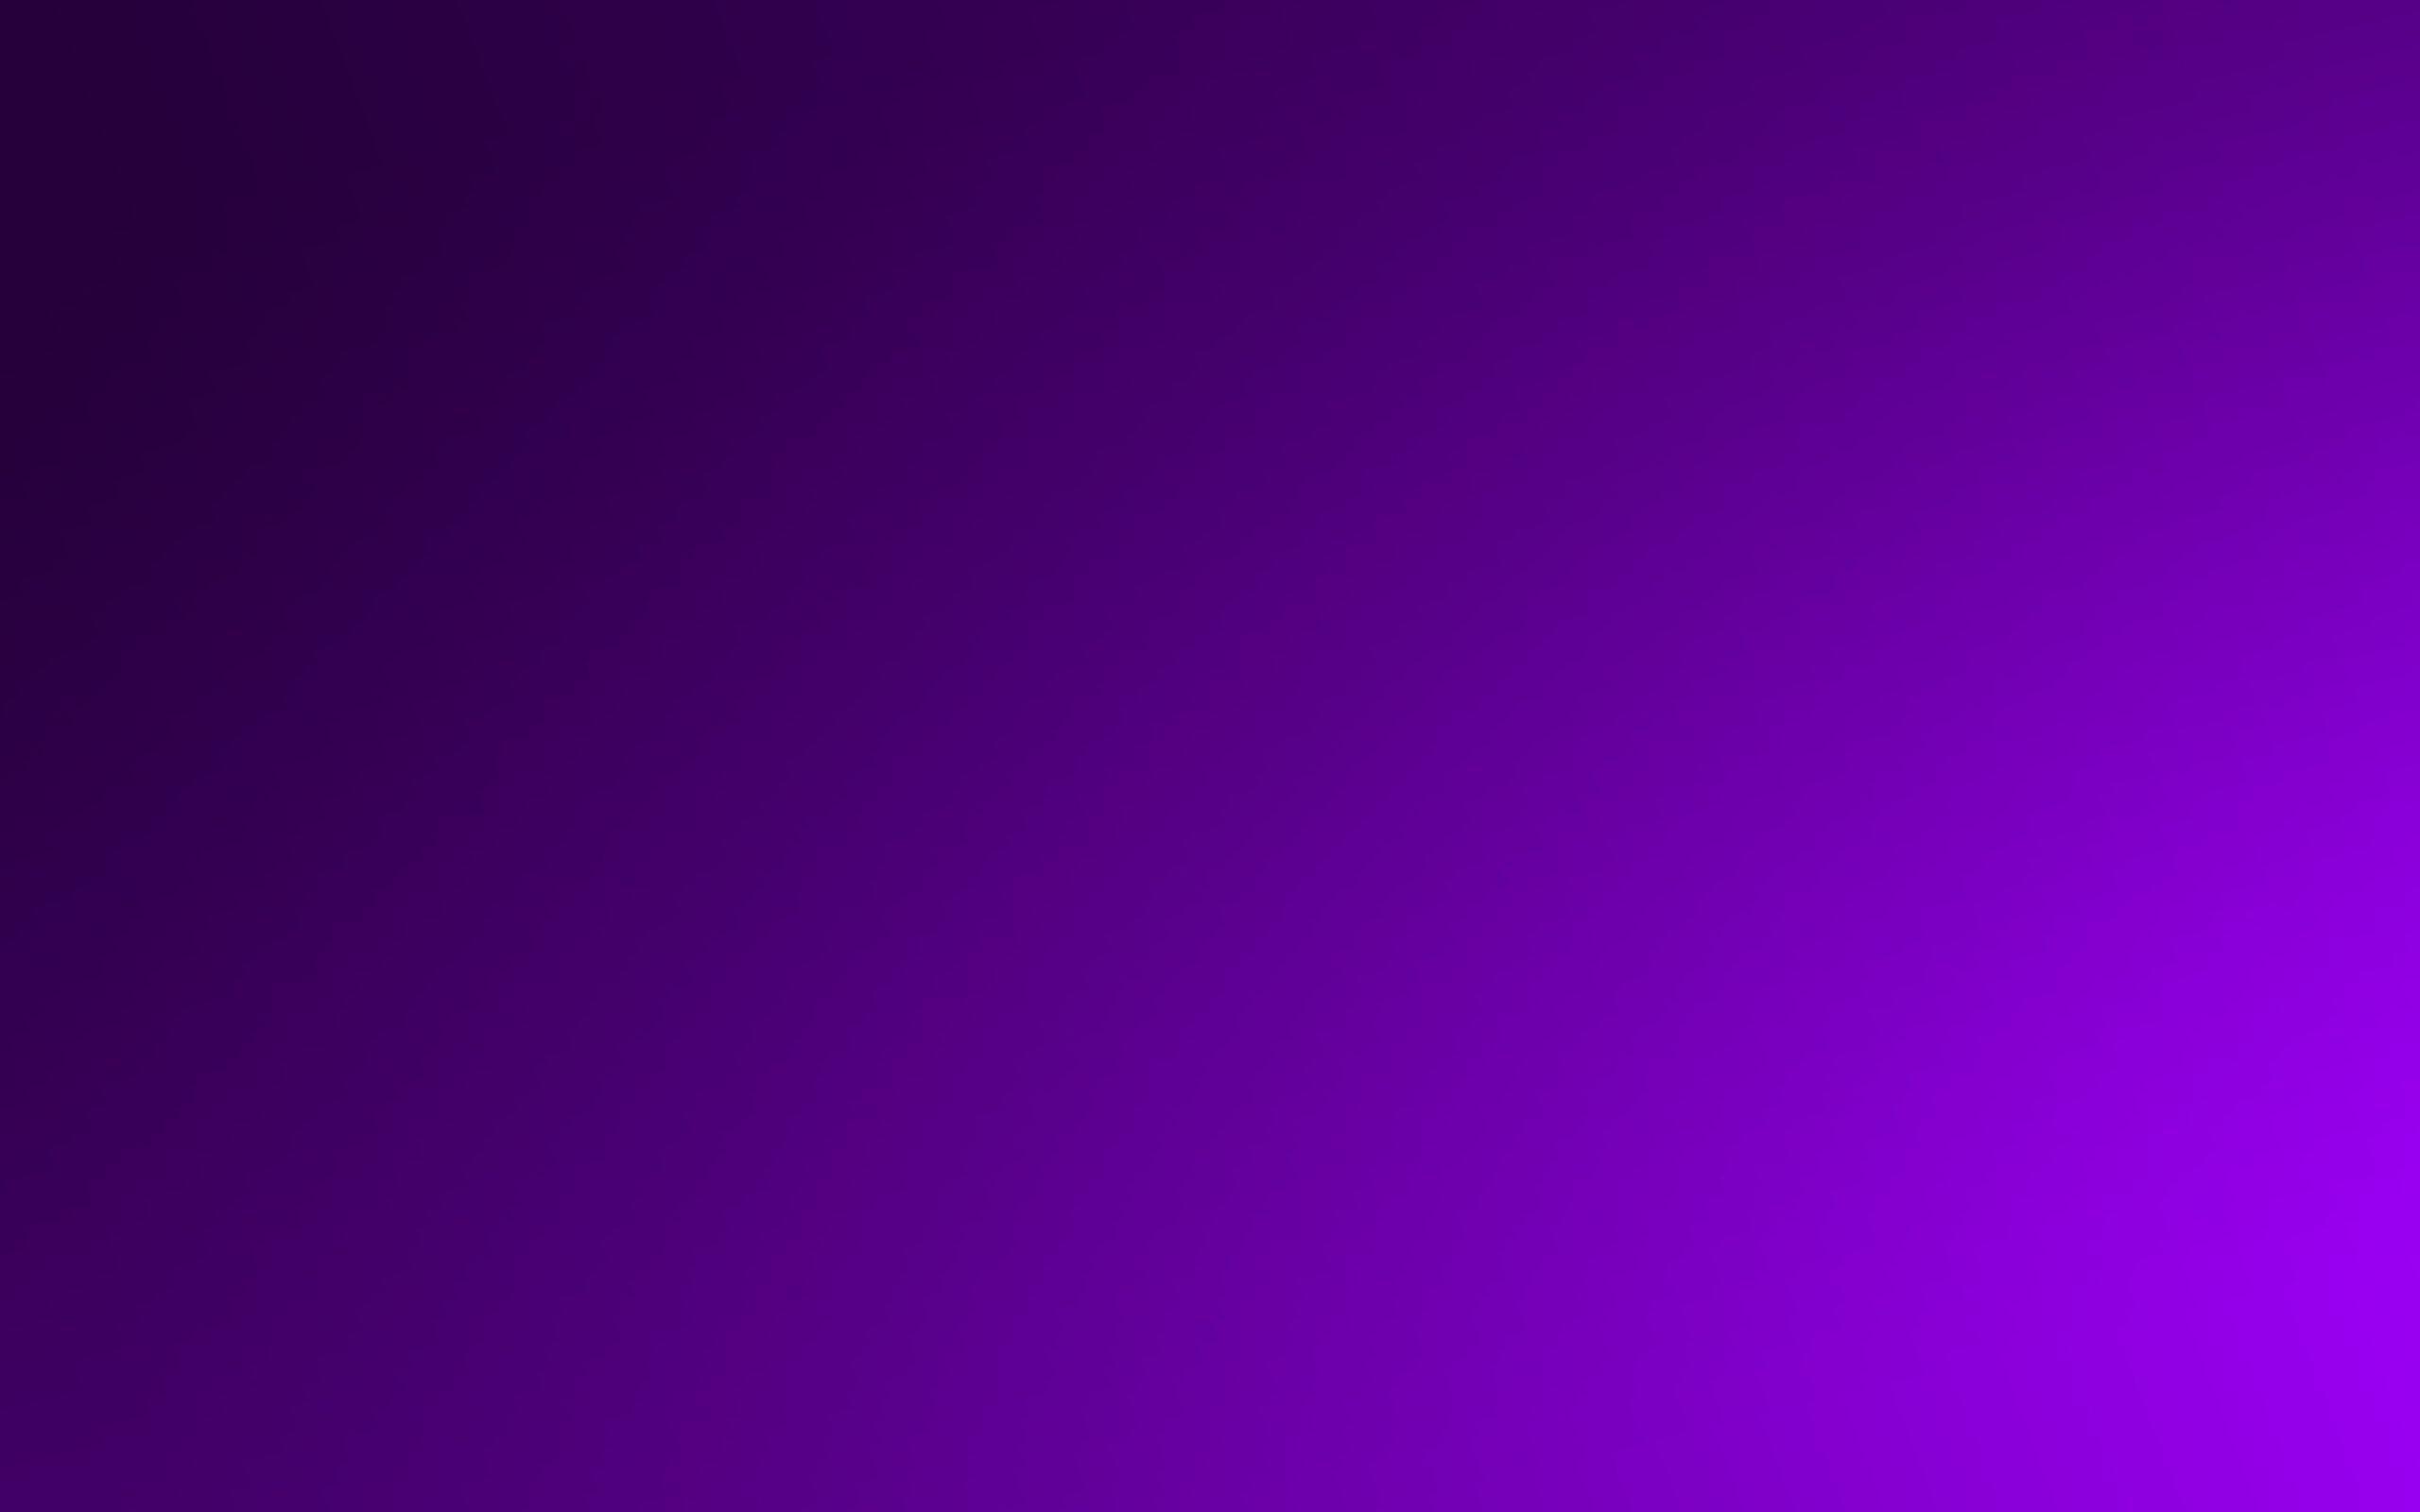 Purple Gradient Wallpapers Top Free Purple Gradient